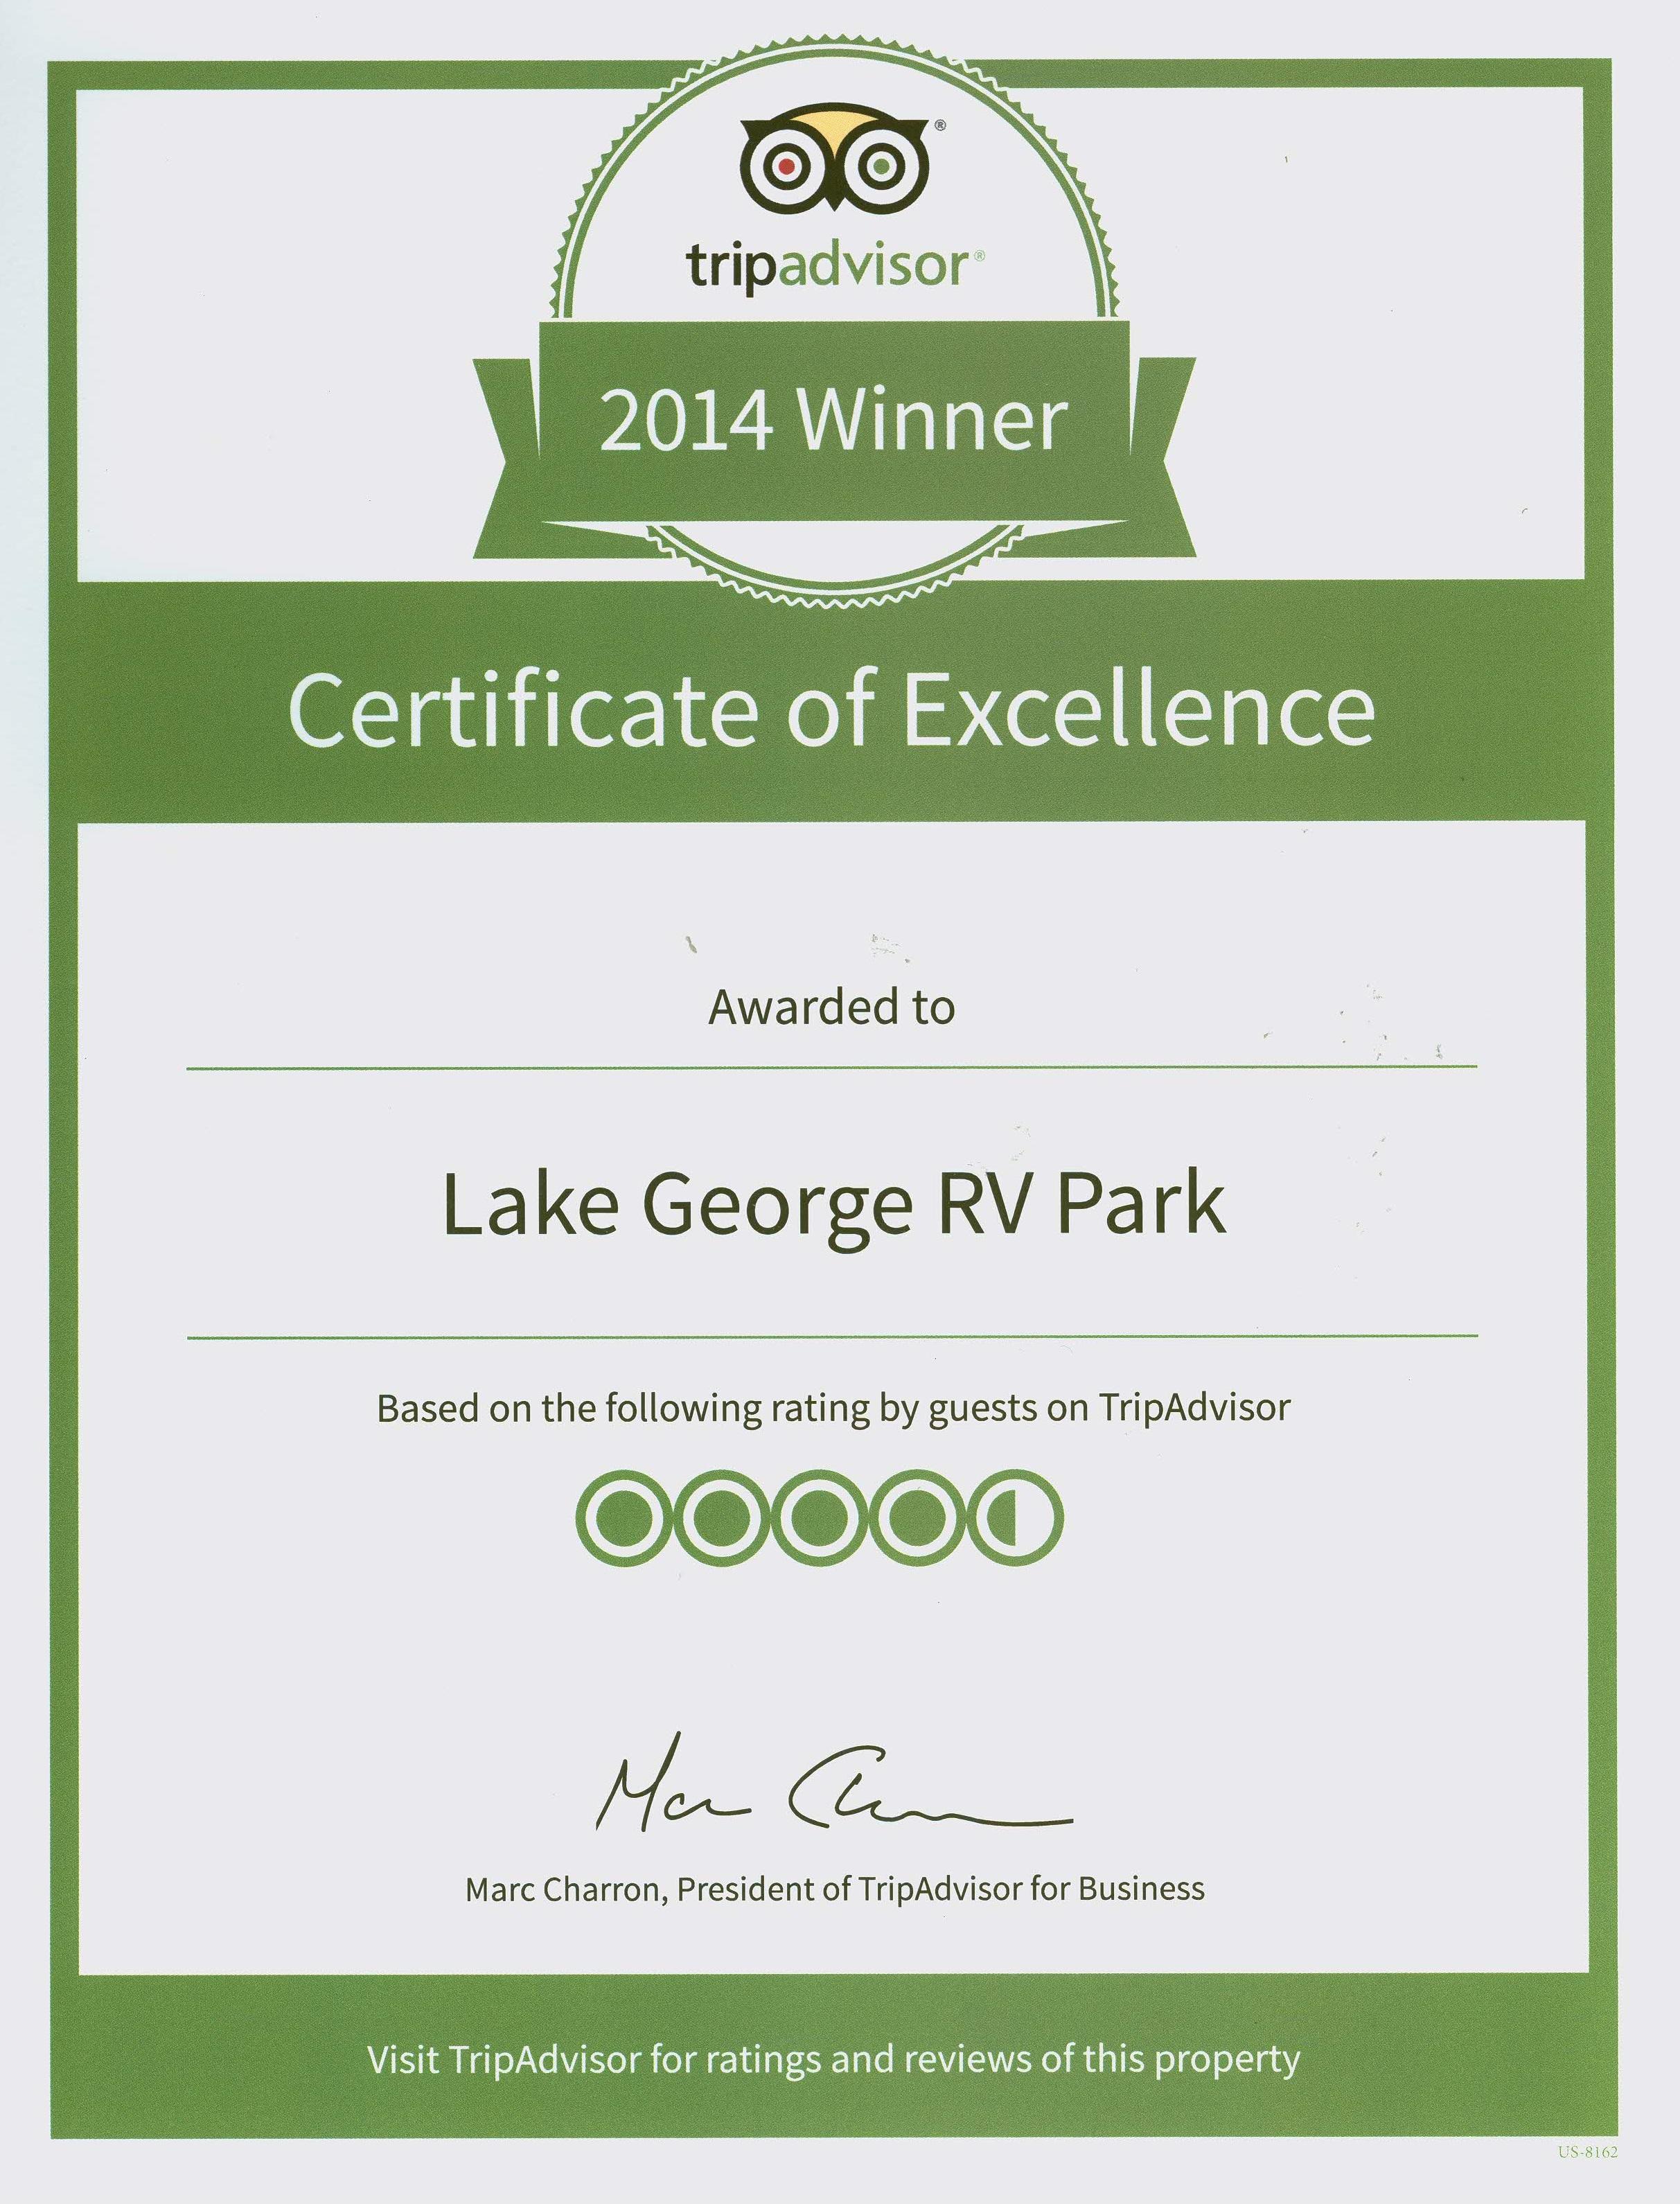 2014 Tripadvisor Certificate Of Excellence Lake George Rv Park